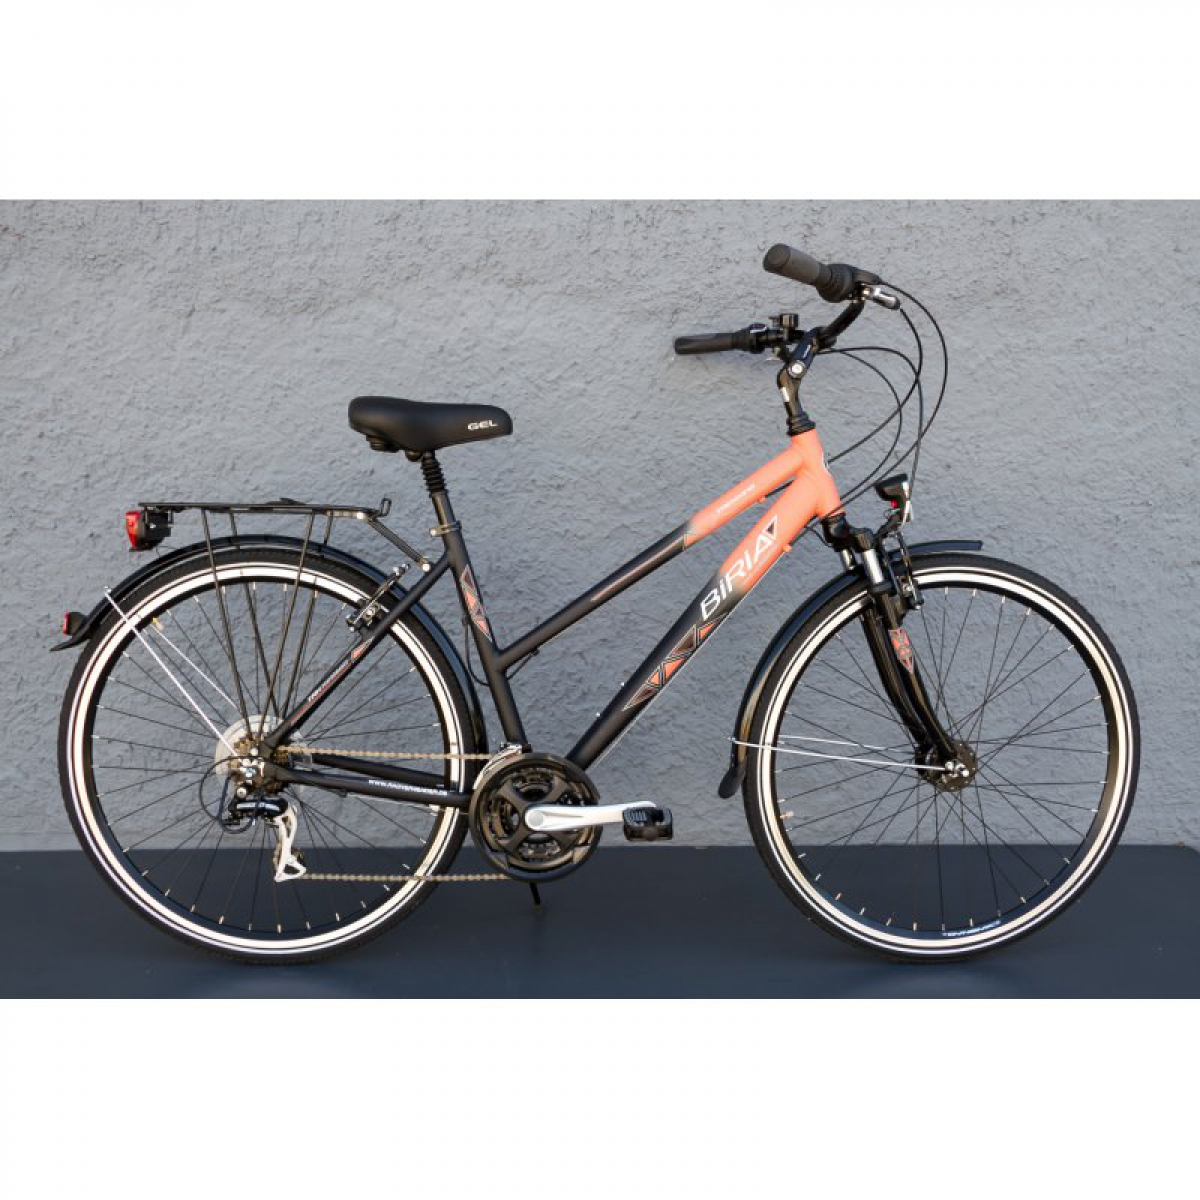 28 zoll alu biria damen trekking bike shimano 21 gang. Black Bedroom Furniture Sets. Home Design Ideas